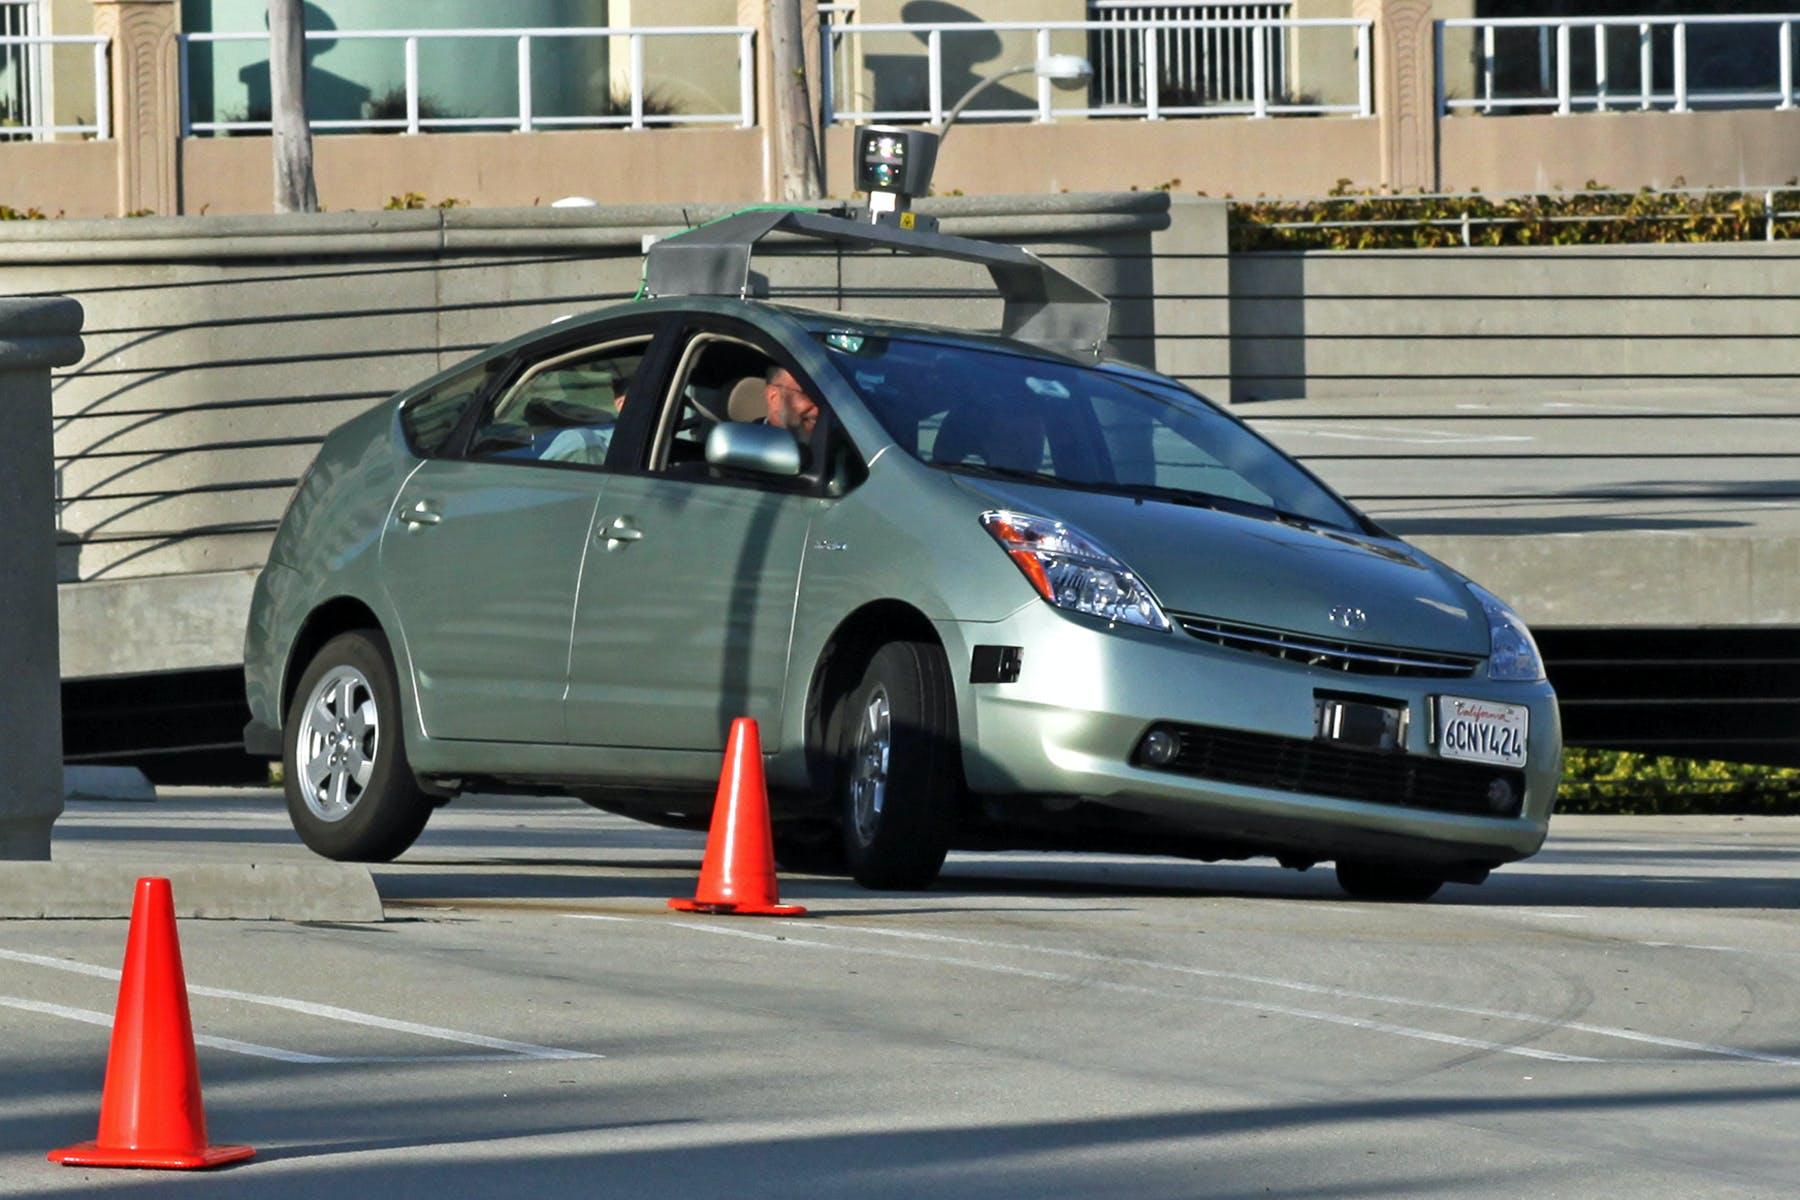 Auto Accident Attorneys In No